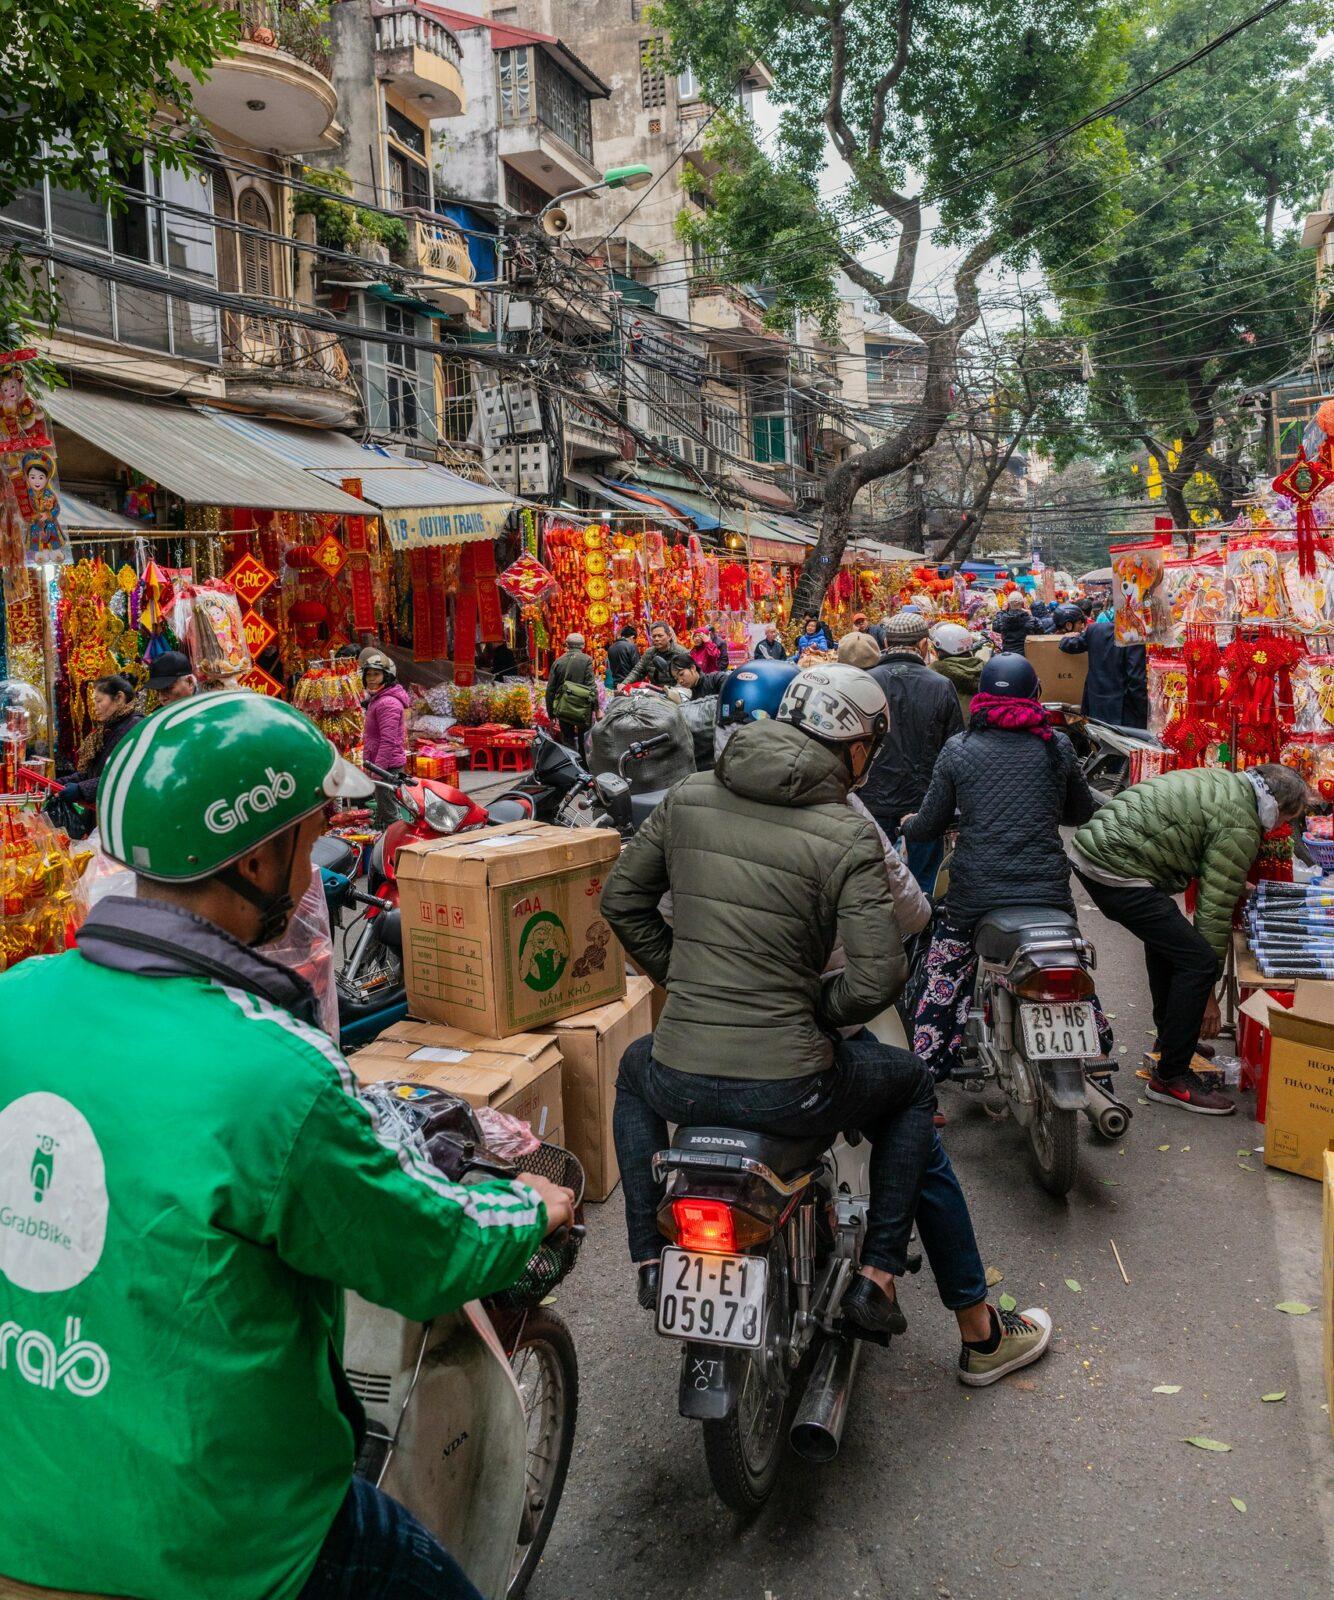 Image of a grab motorbike in Hanoi